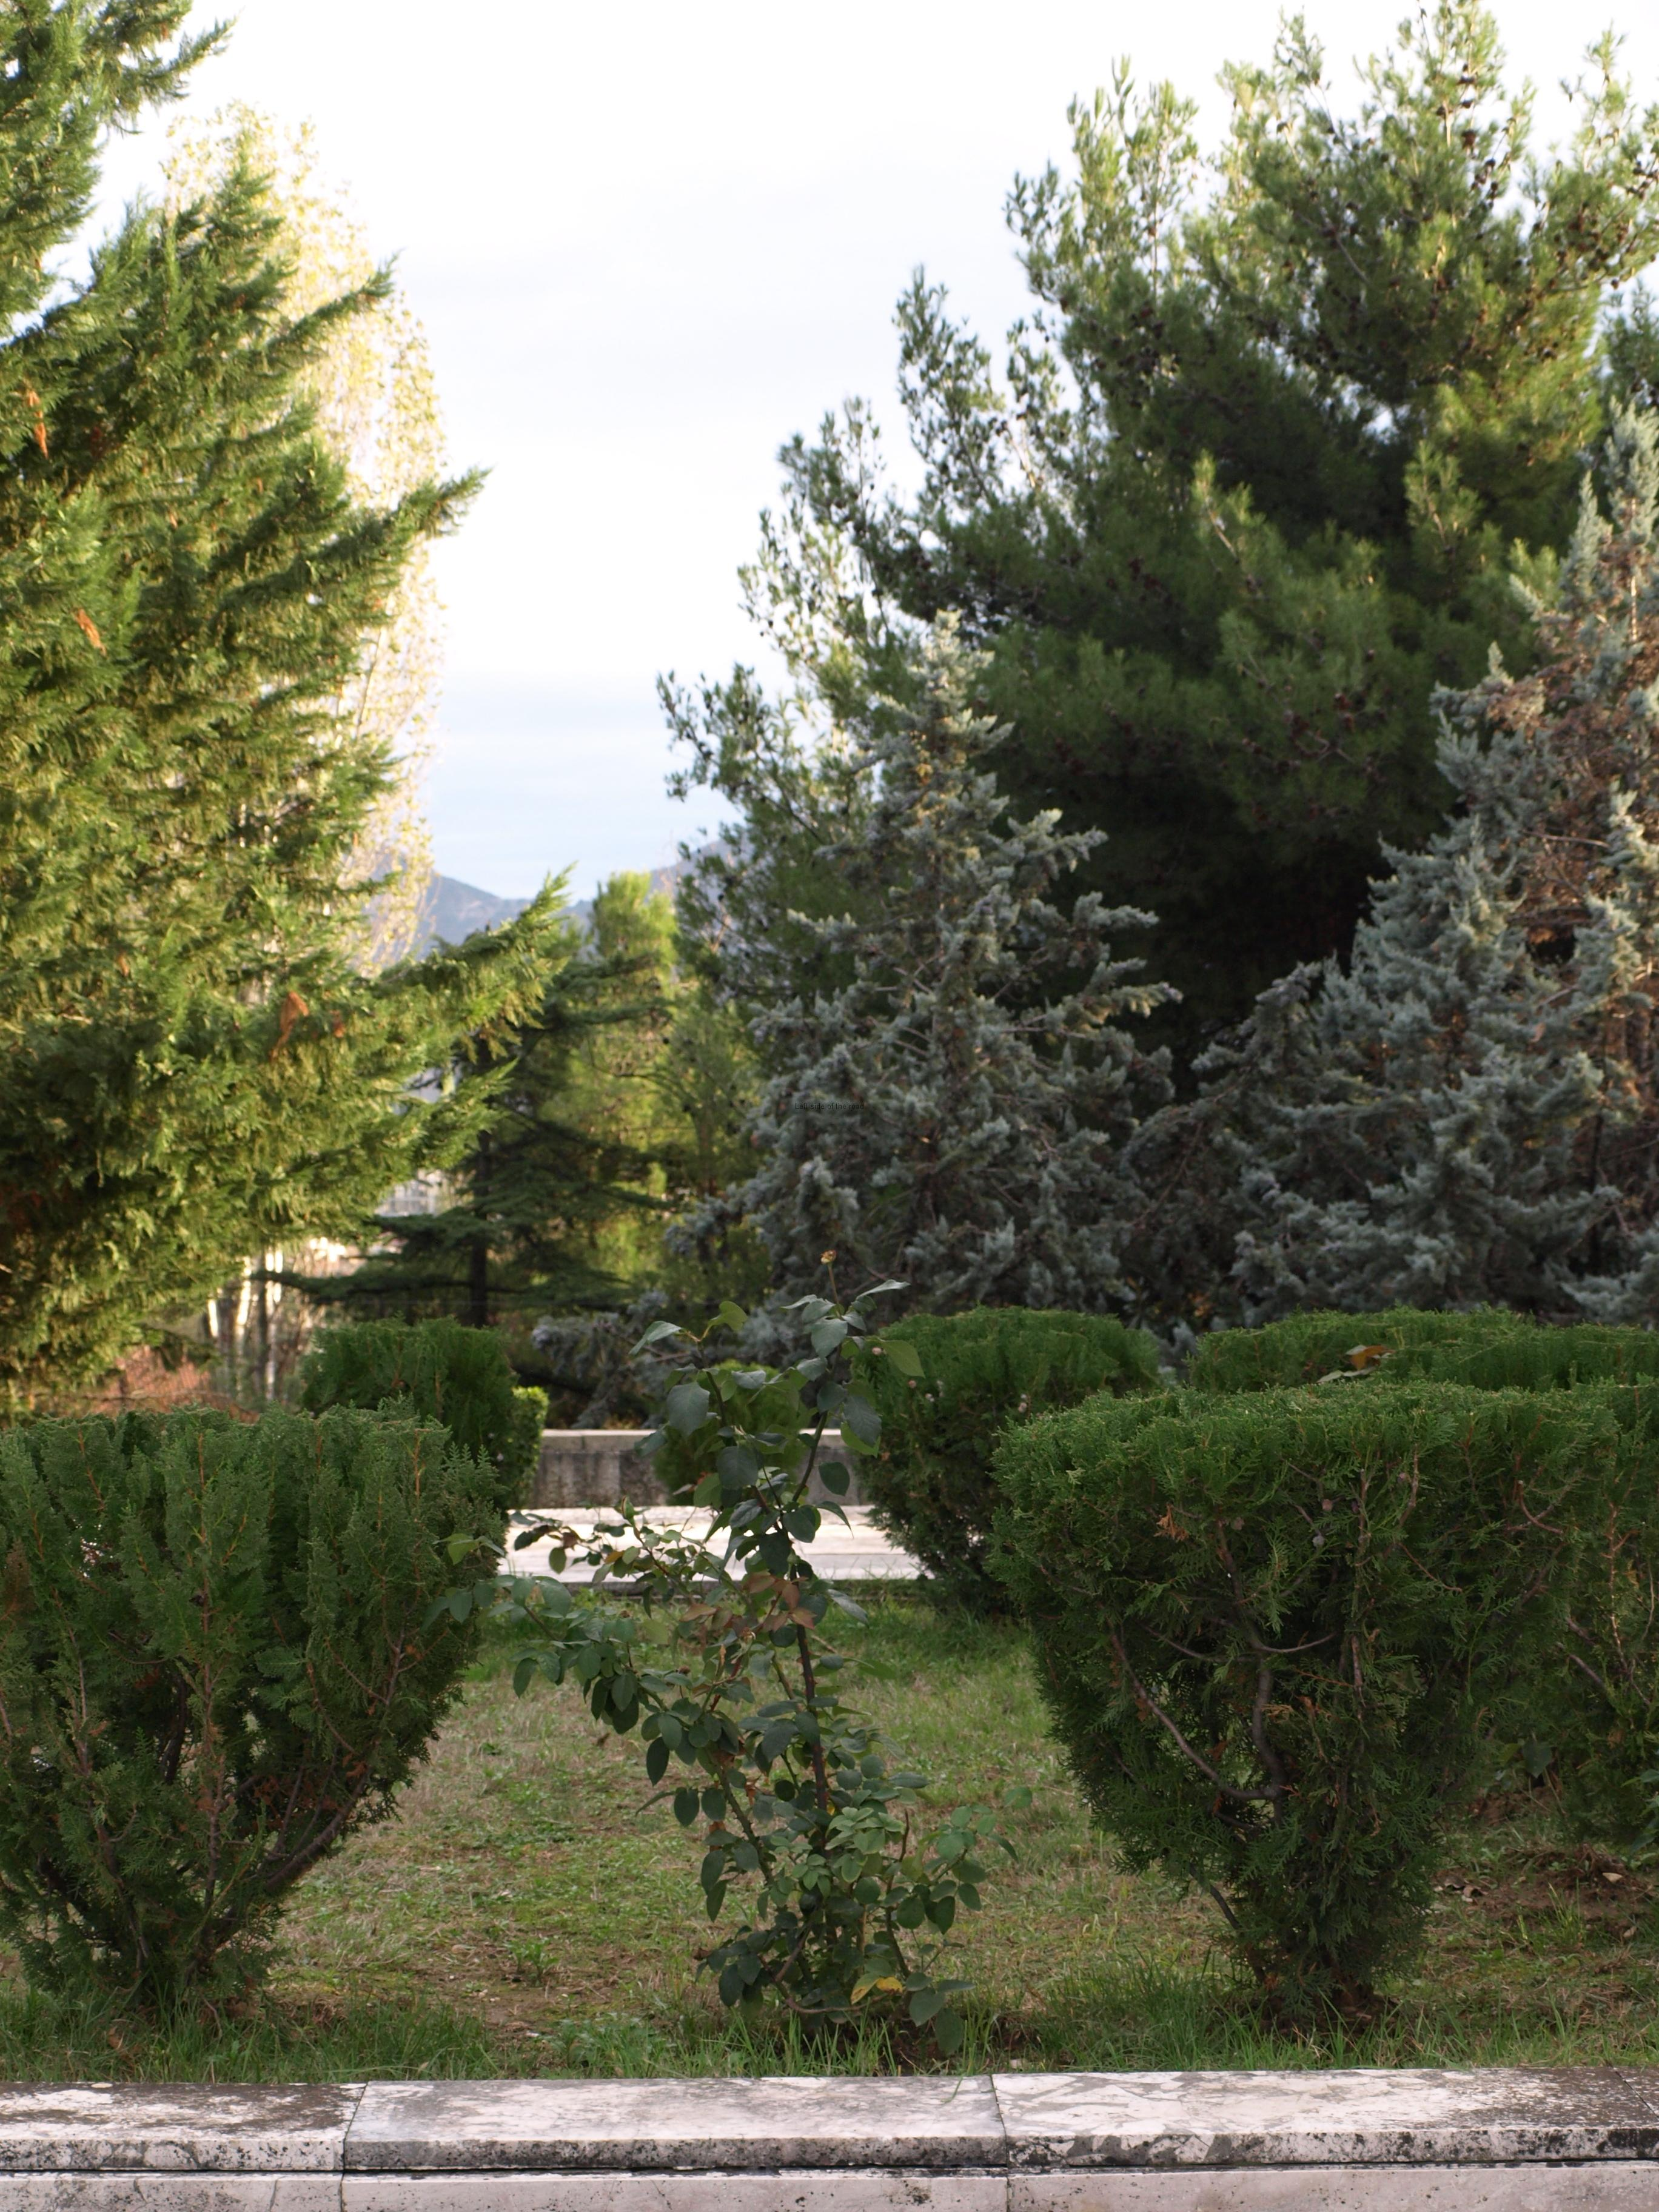 Tirana Martyrs' Cemetery - Enver Hoxha